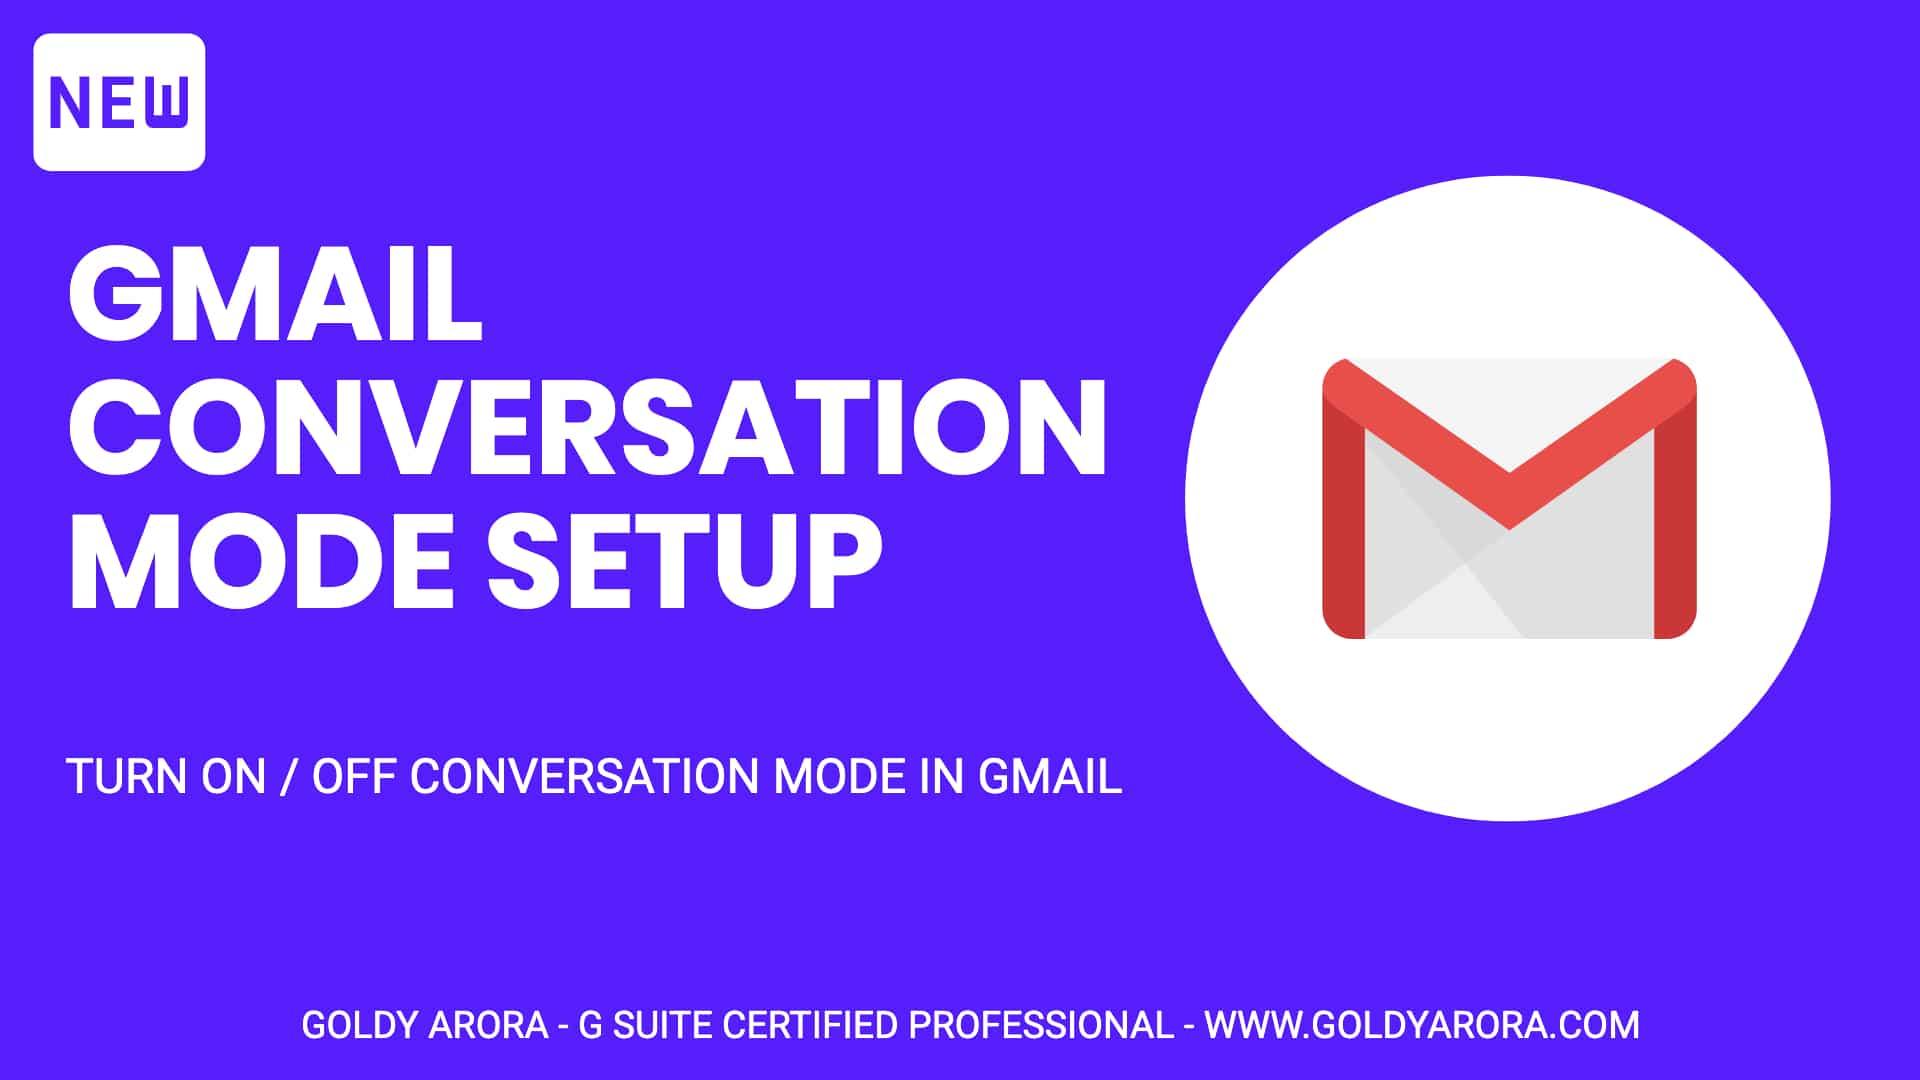 Gmail Conversation Mode Setup